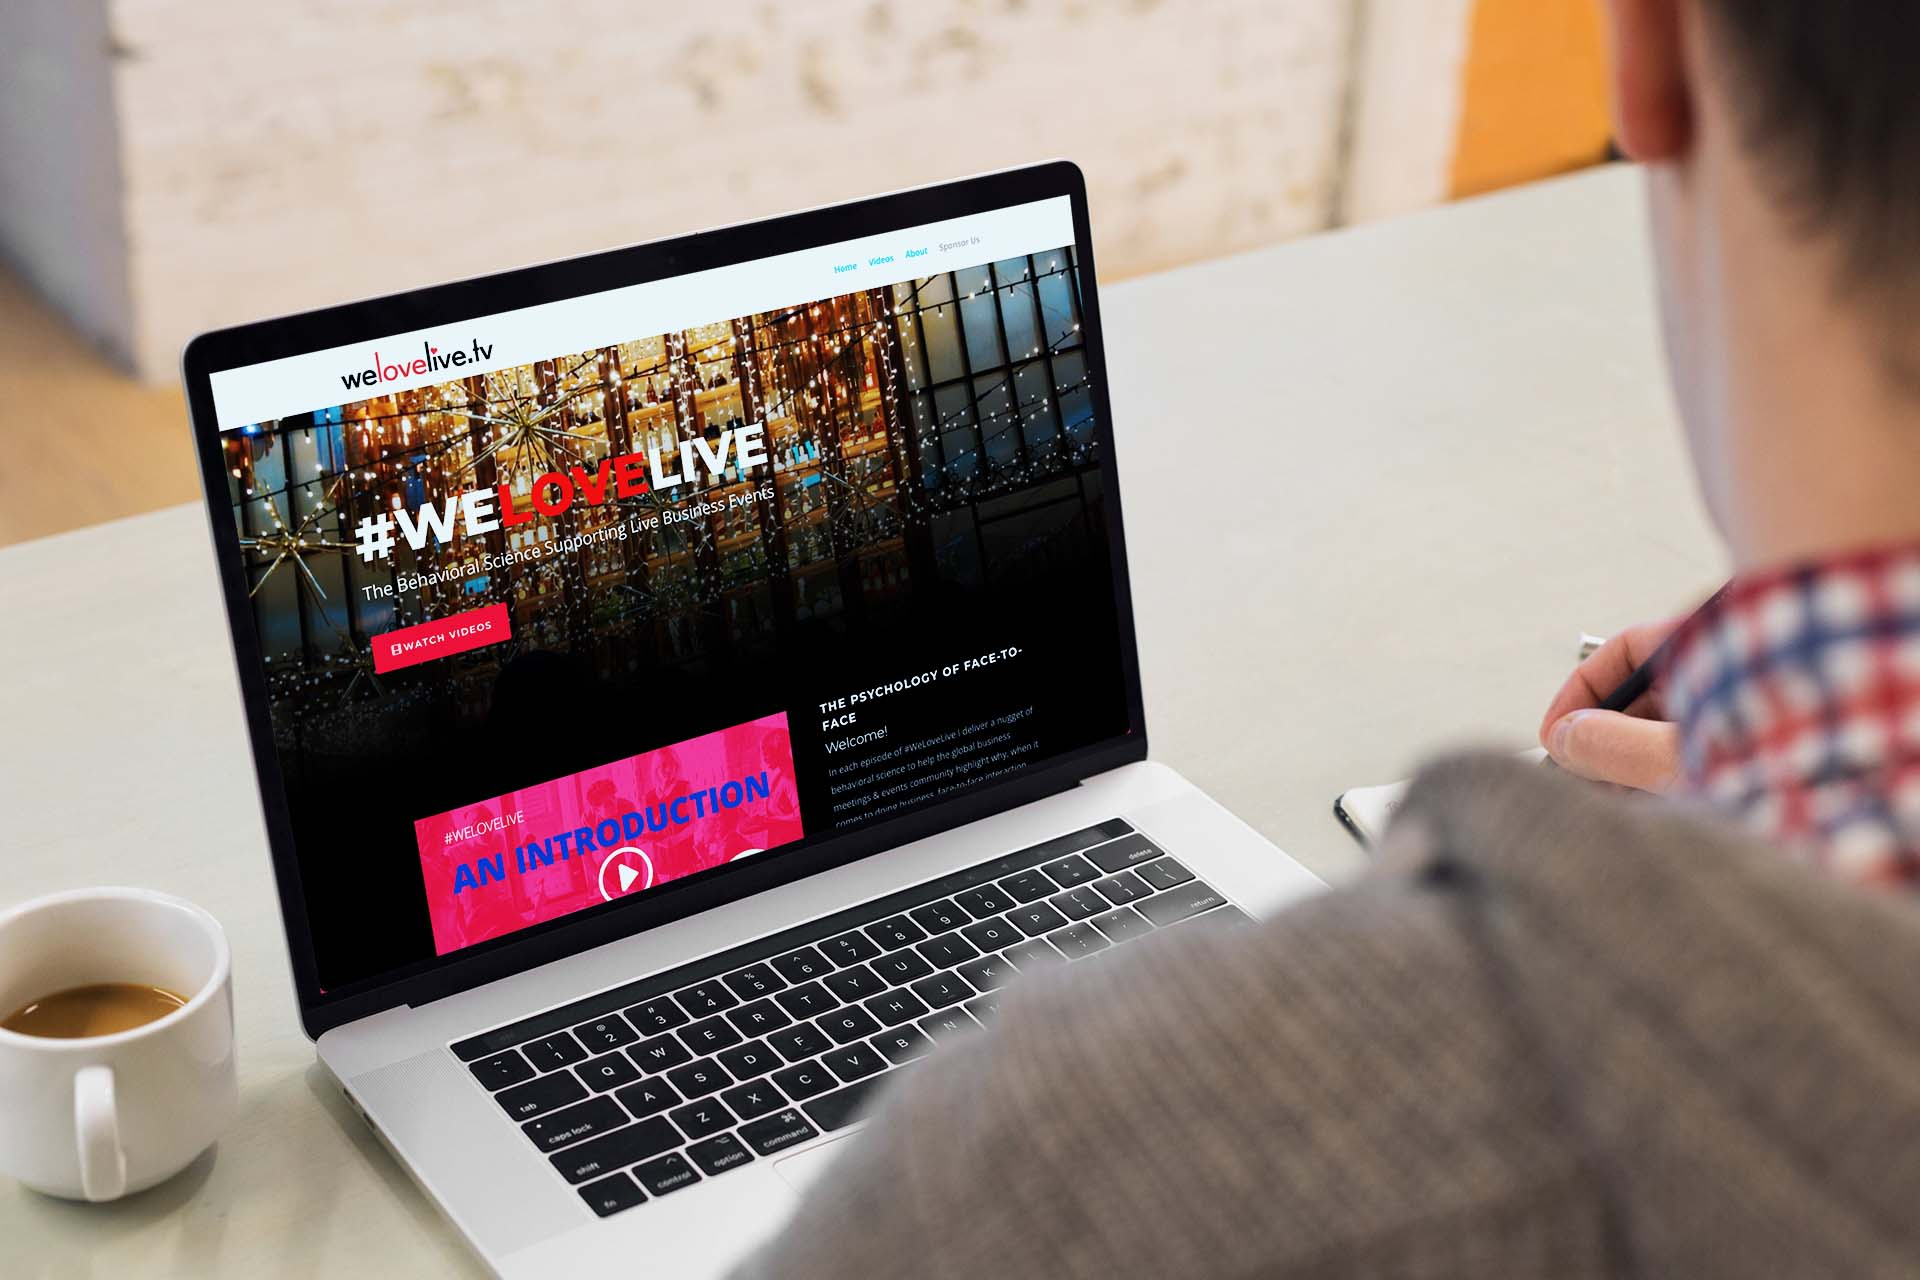 welovelive.tv web design project